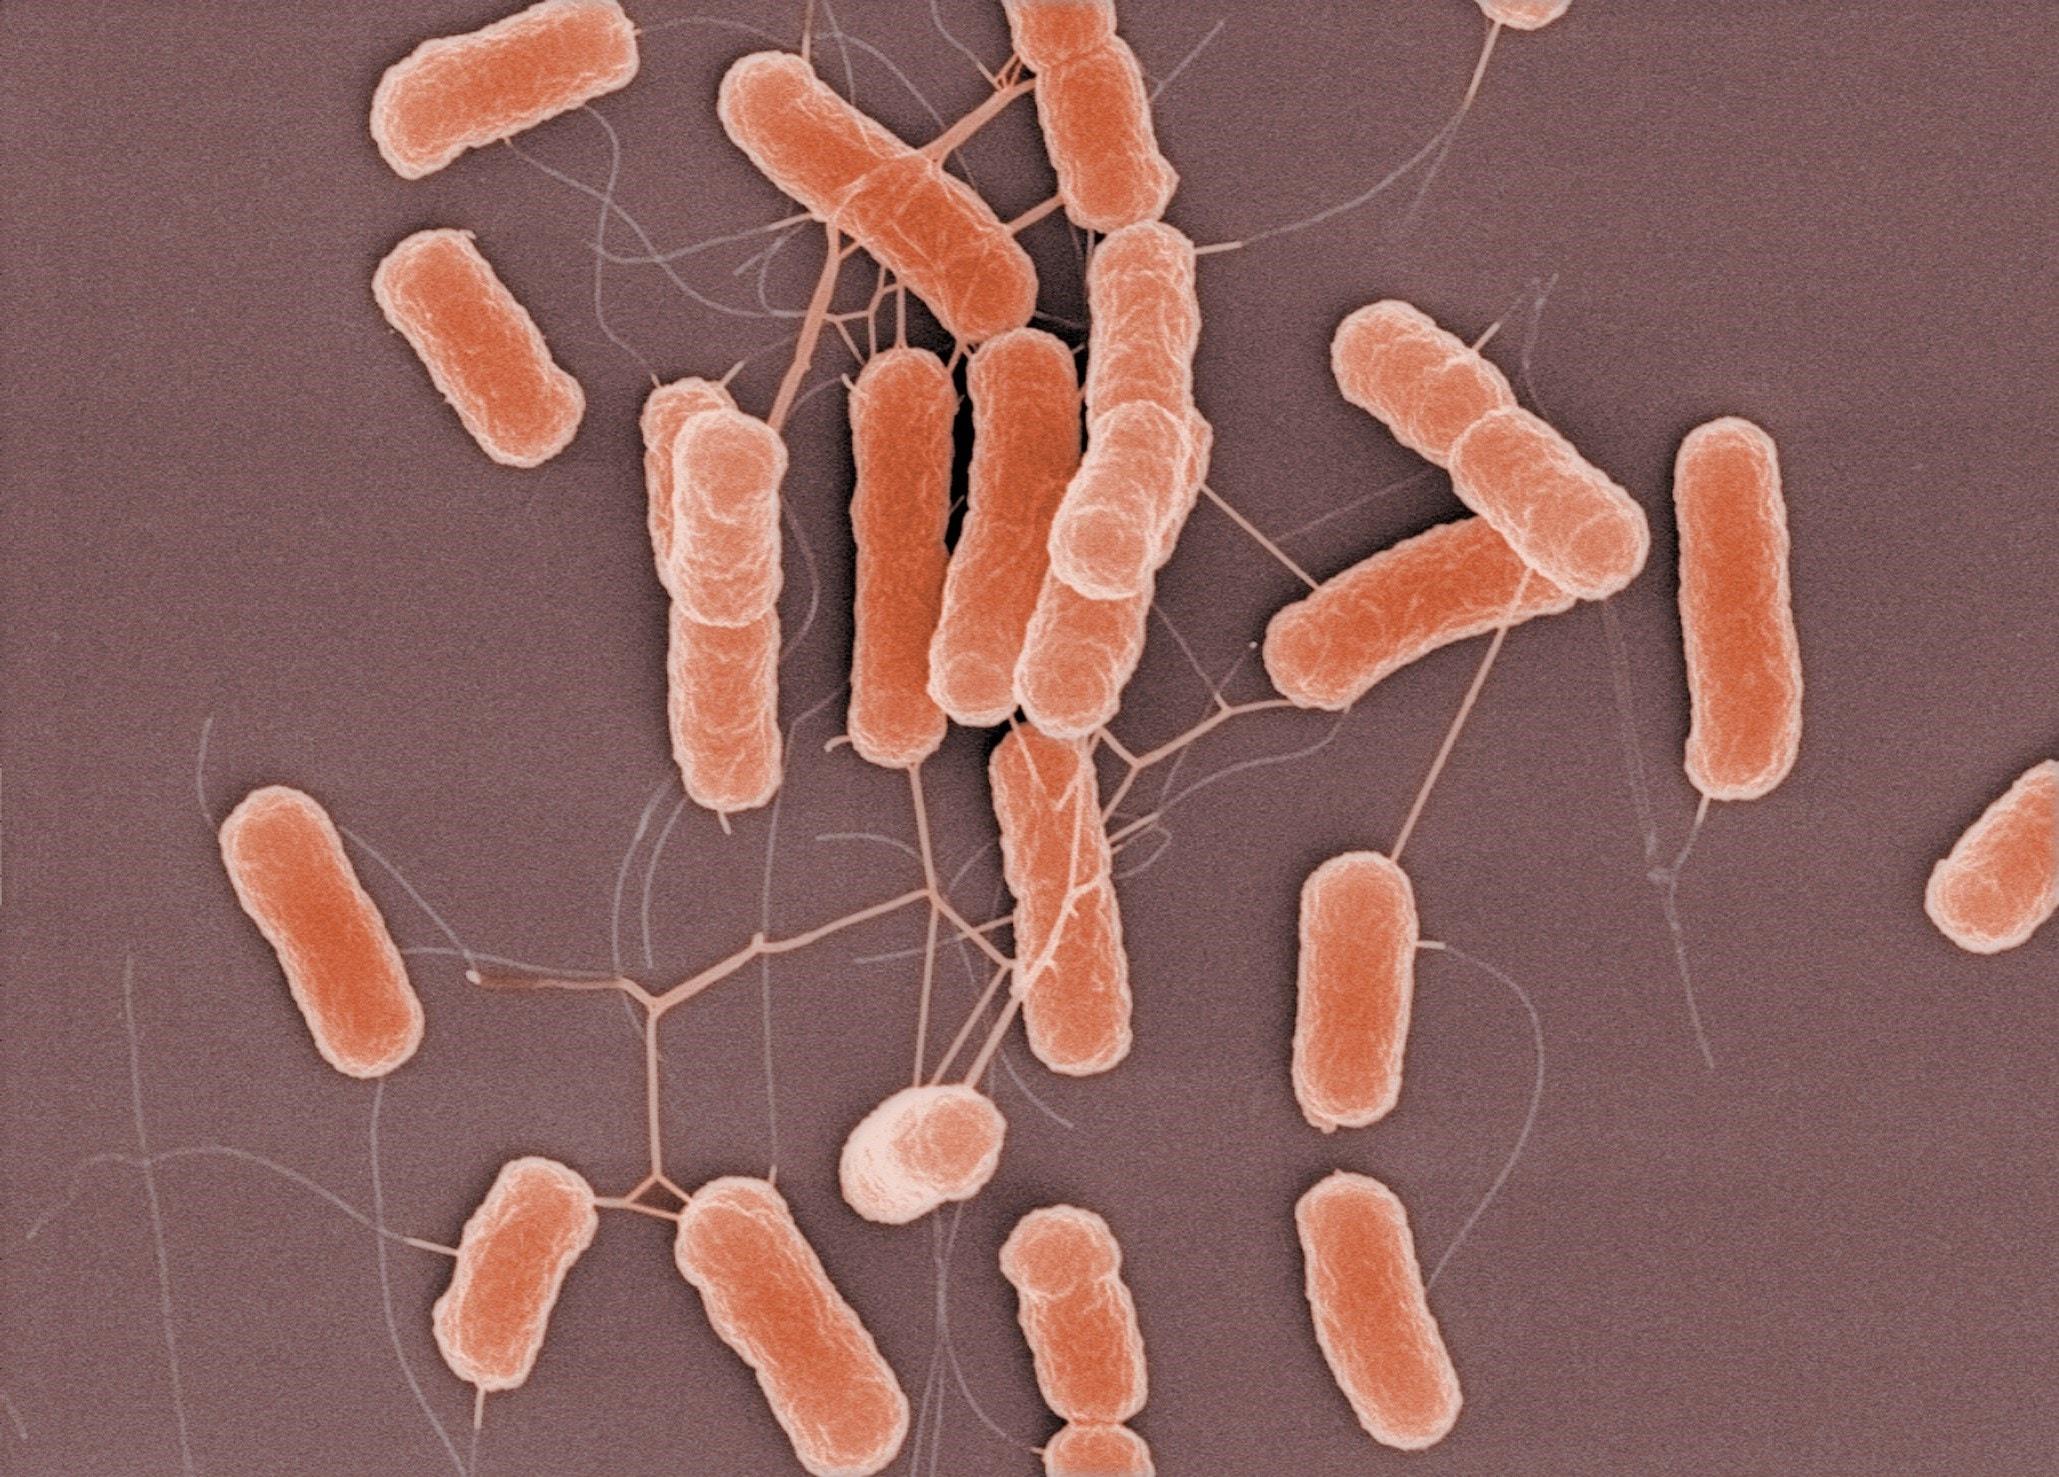 Photograph of E. coli